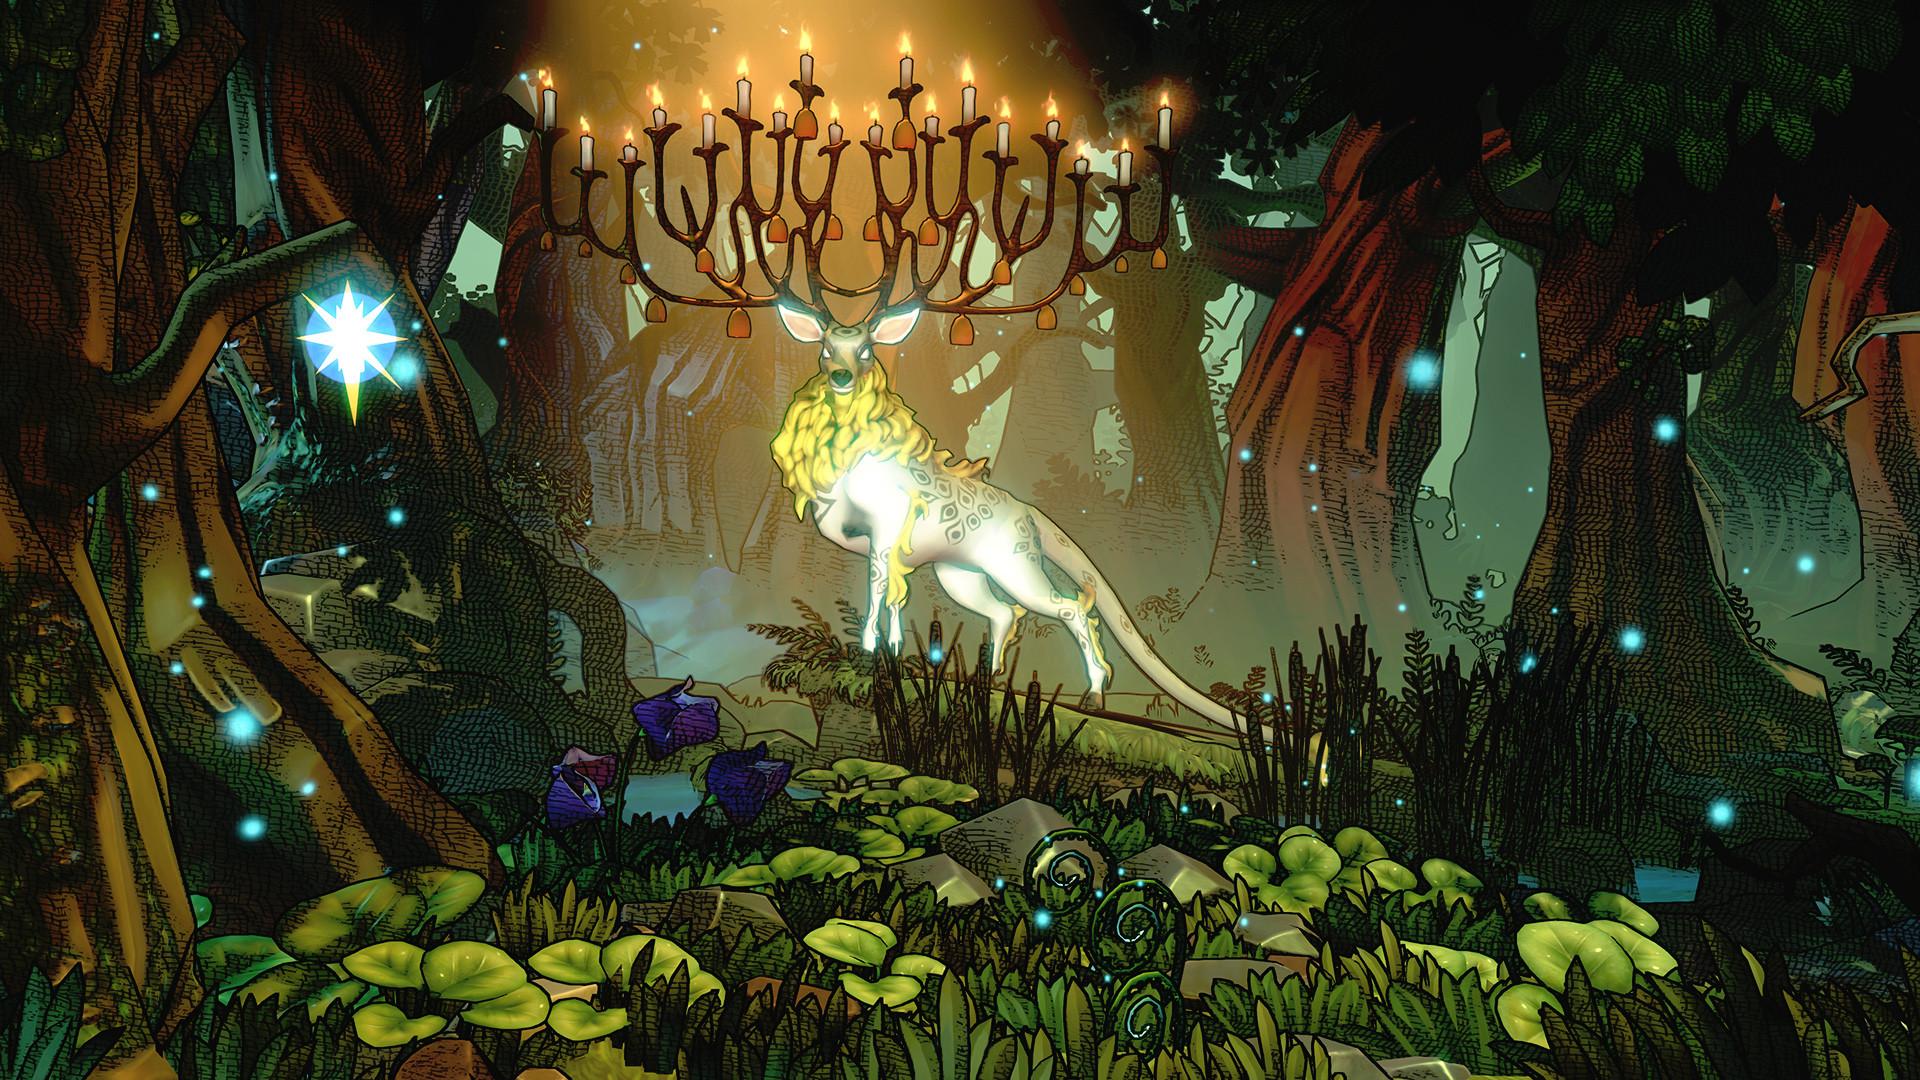 Shawn witt forest 01